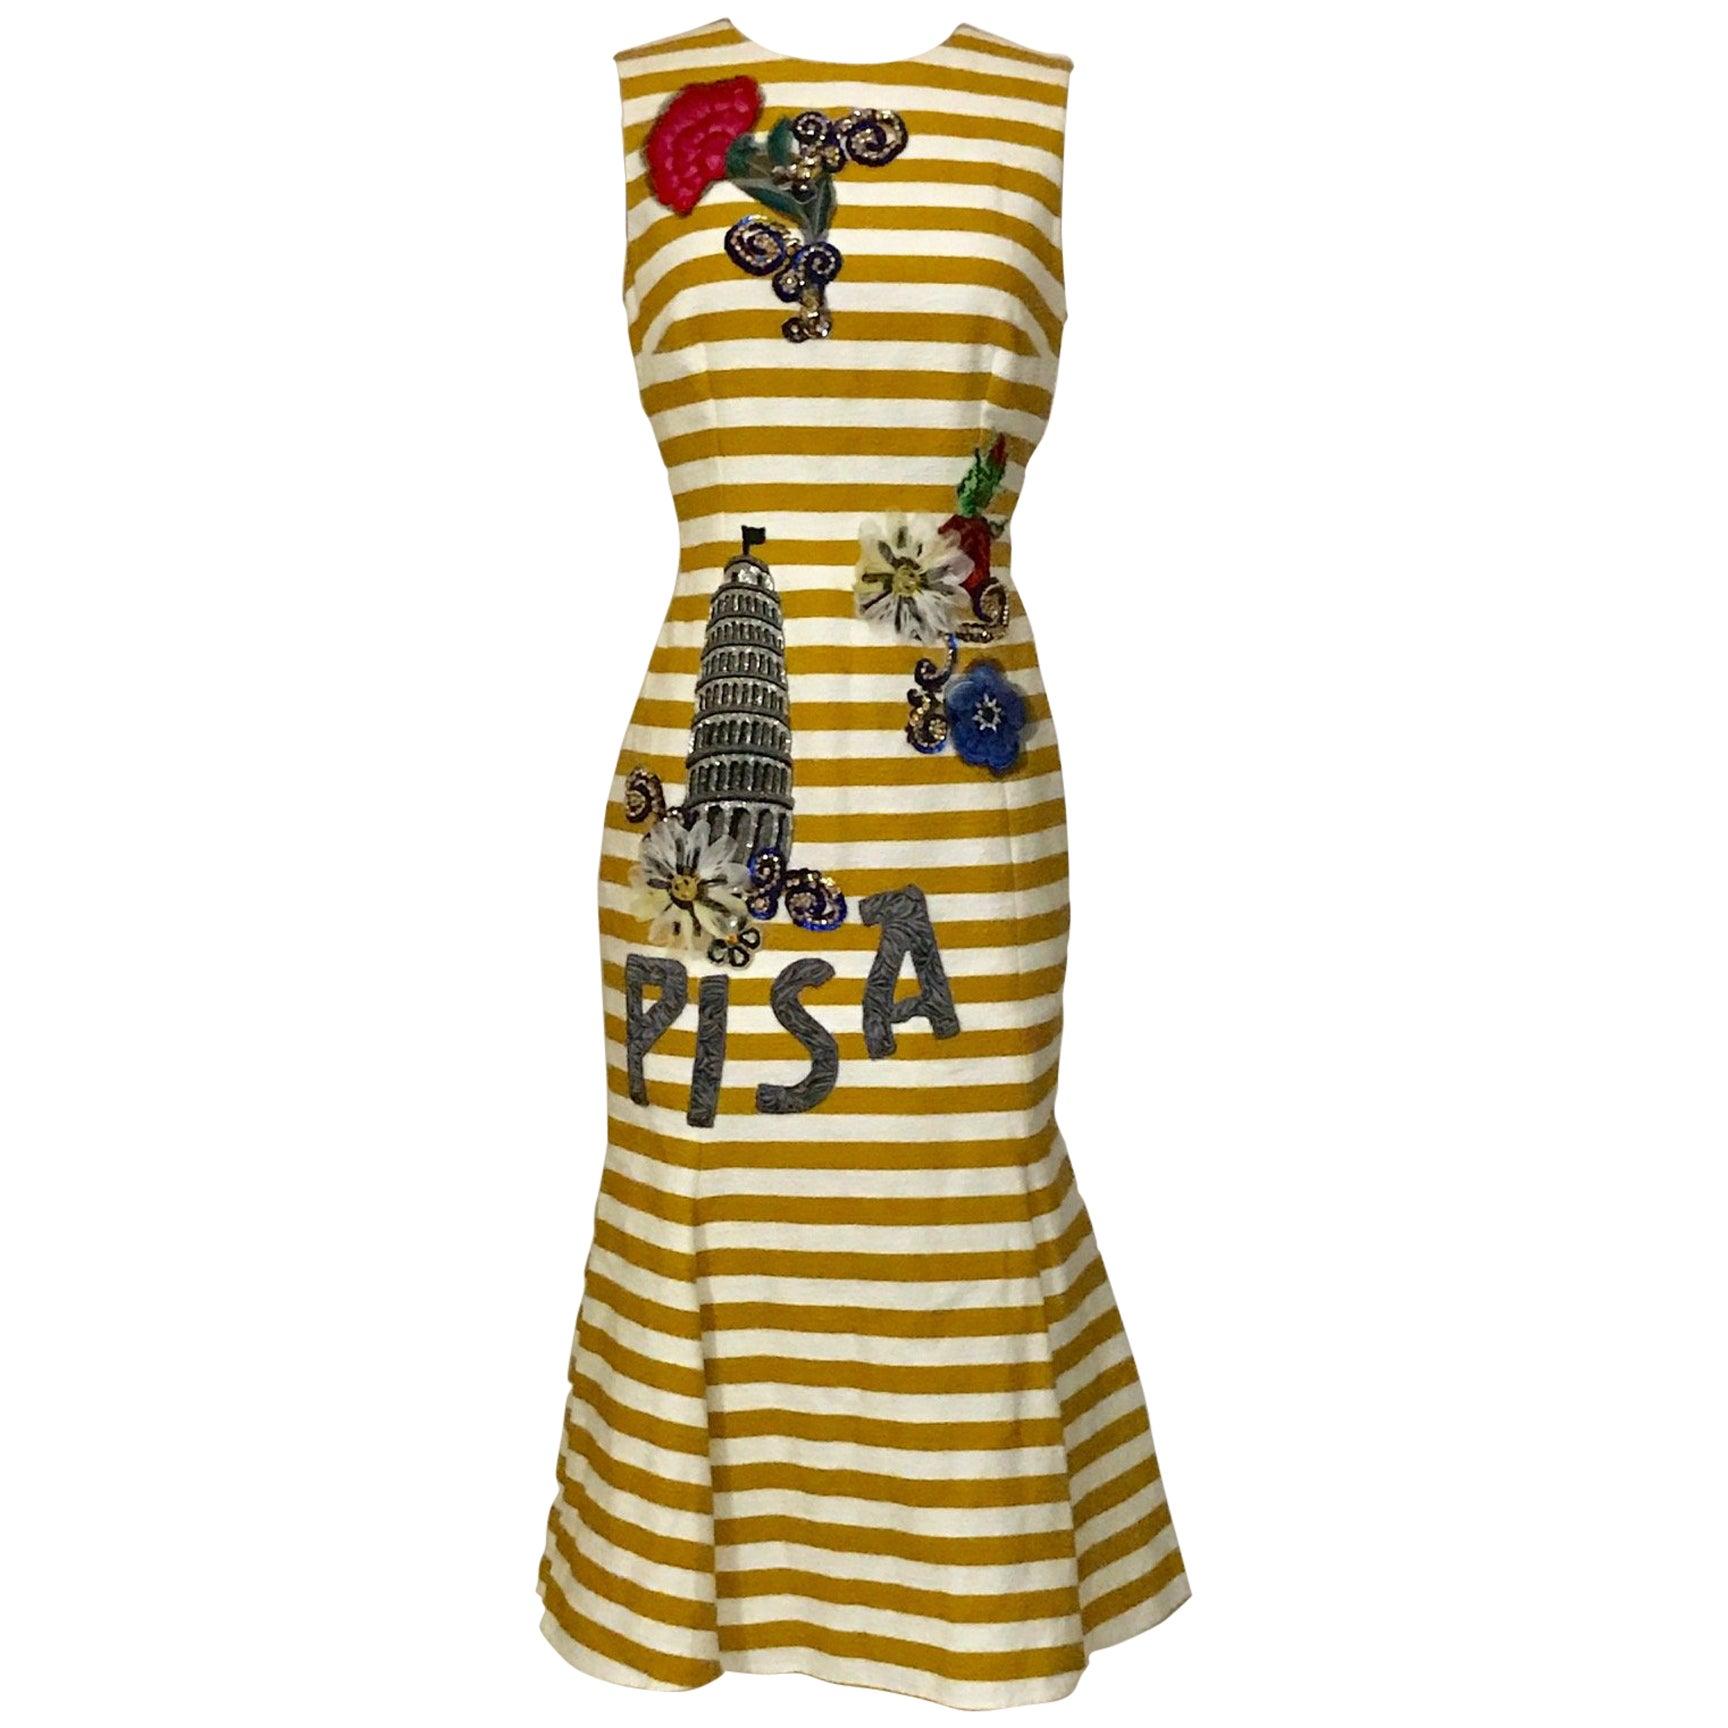 New Dolce & Gabbana Yellow and White Striped Tower of Pisa Flared Midi Dress